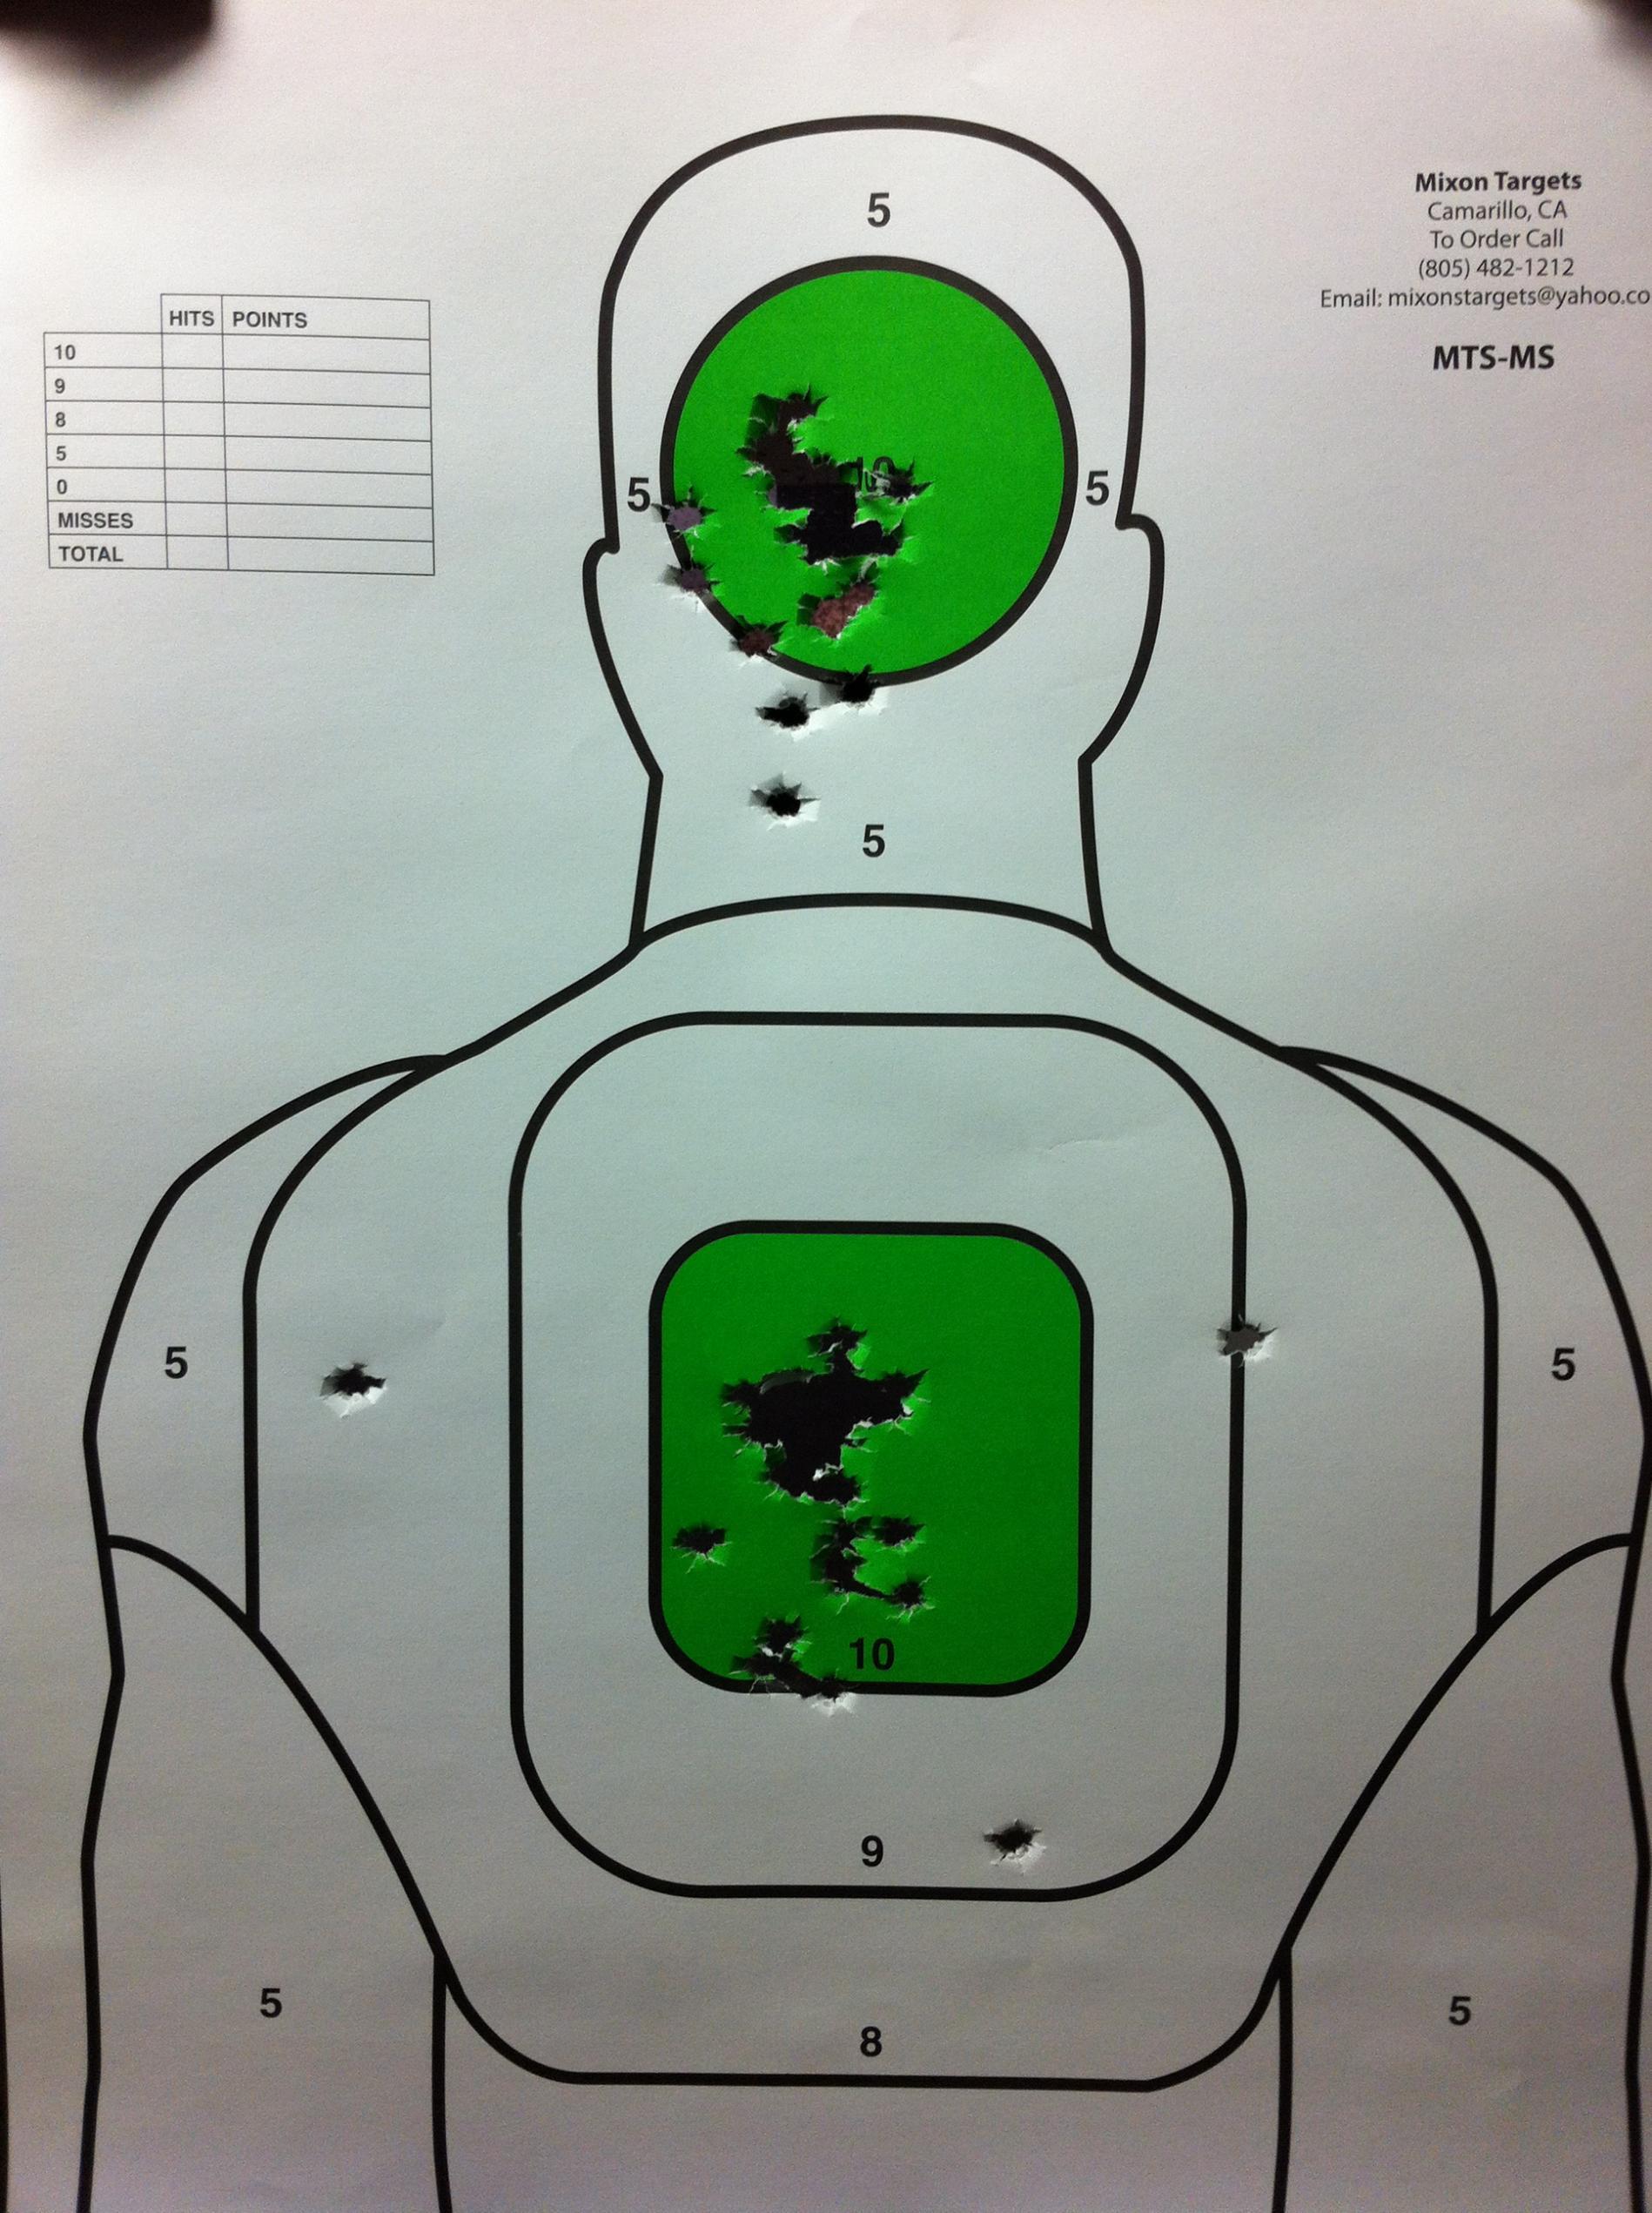 Range Report on my new Sig Sauer P229-img_4538.jpg